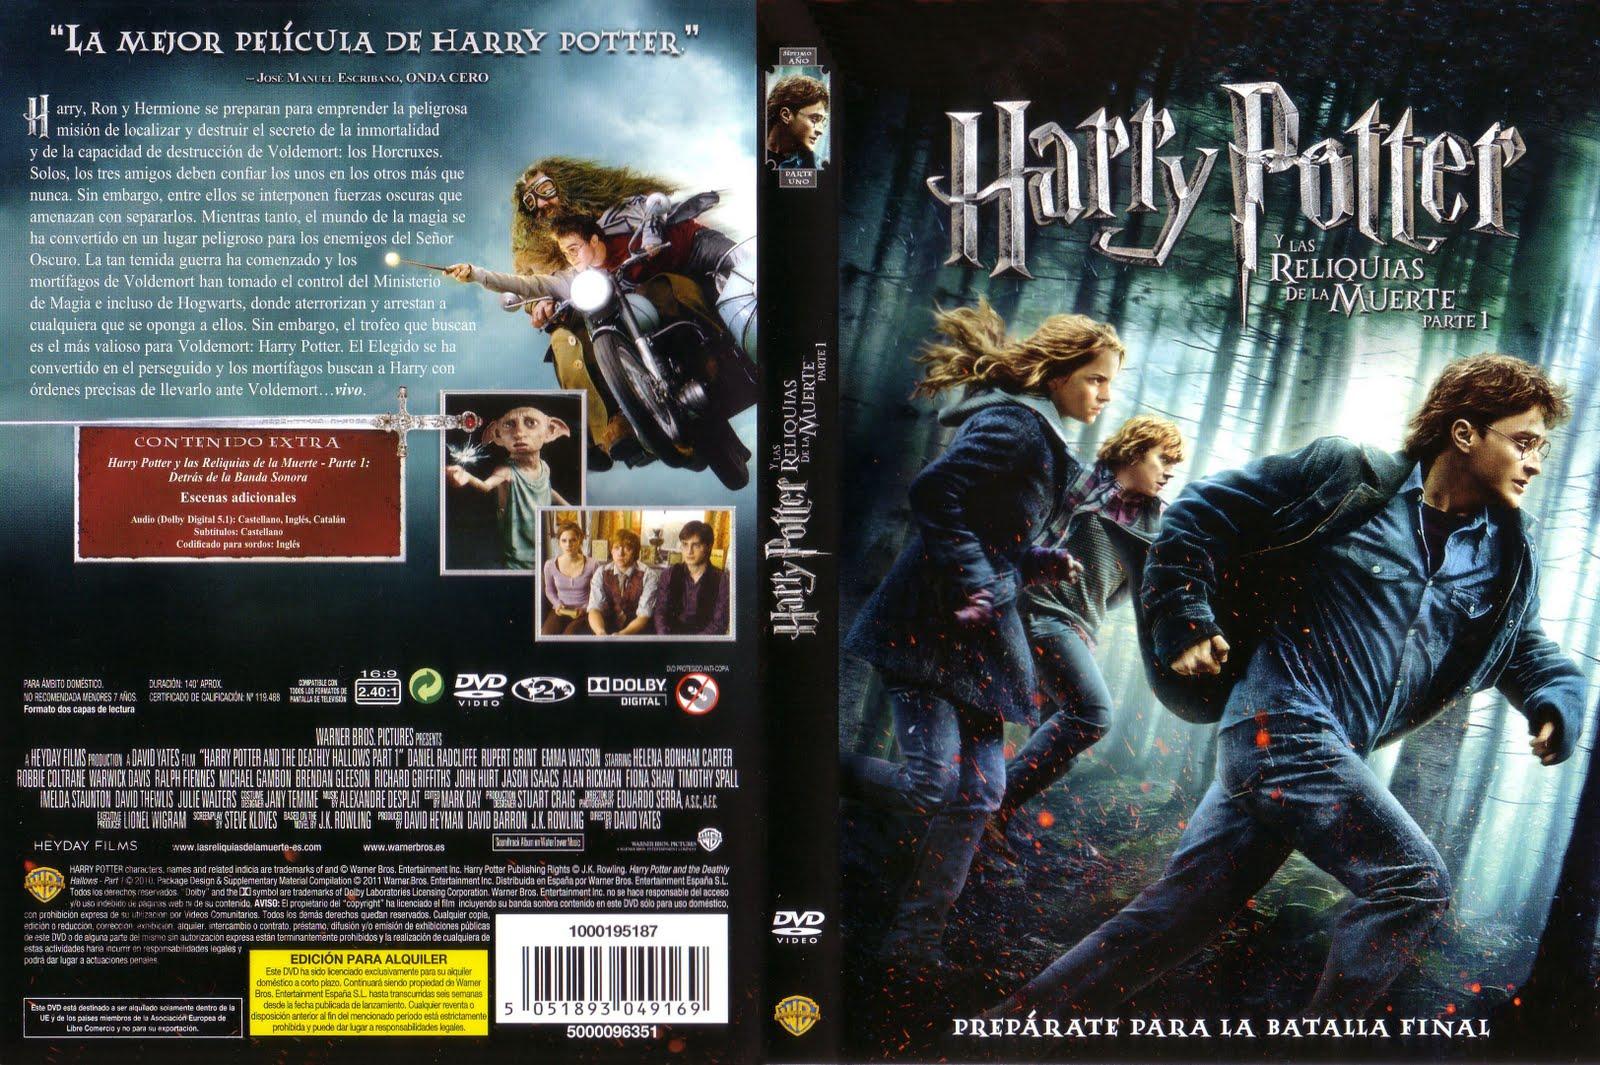 http://4.bp.blogspot.com/-9V7eQ3AxoJY/TmBj7KiCjdI/AAAAAAAAA50/-0KQPu0EtKA/s1600/Harry+Potter+Y+Las+Reliquias+De+La+Muerte+Parte+1+Alquiler+Por+Eltamba+-+dvd.jpg